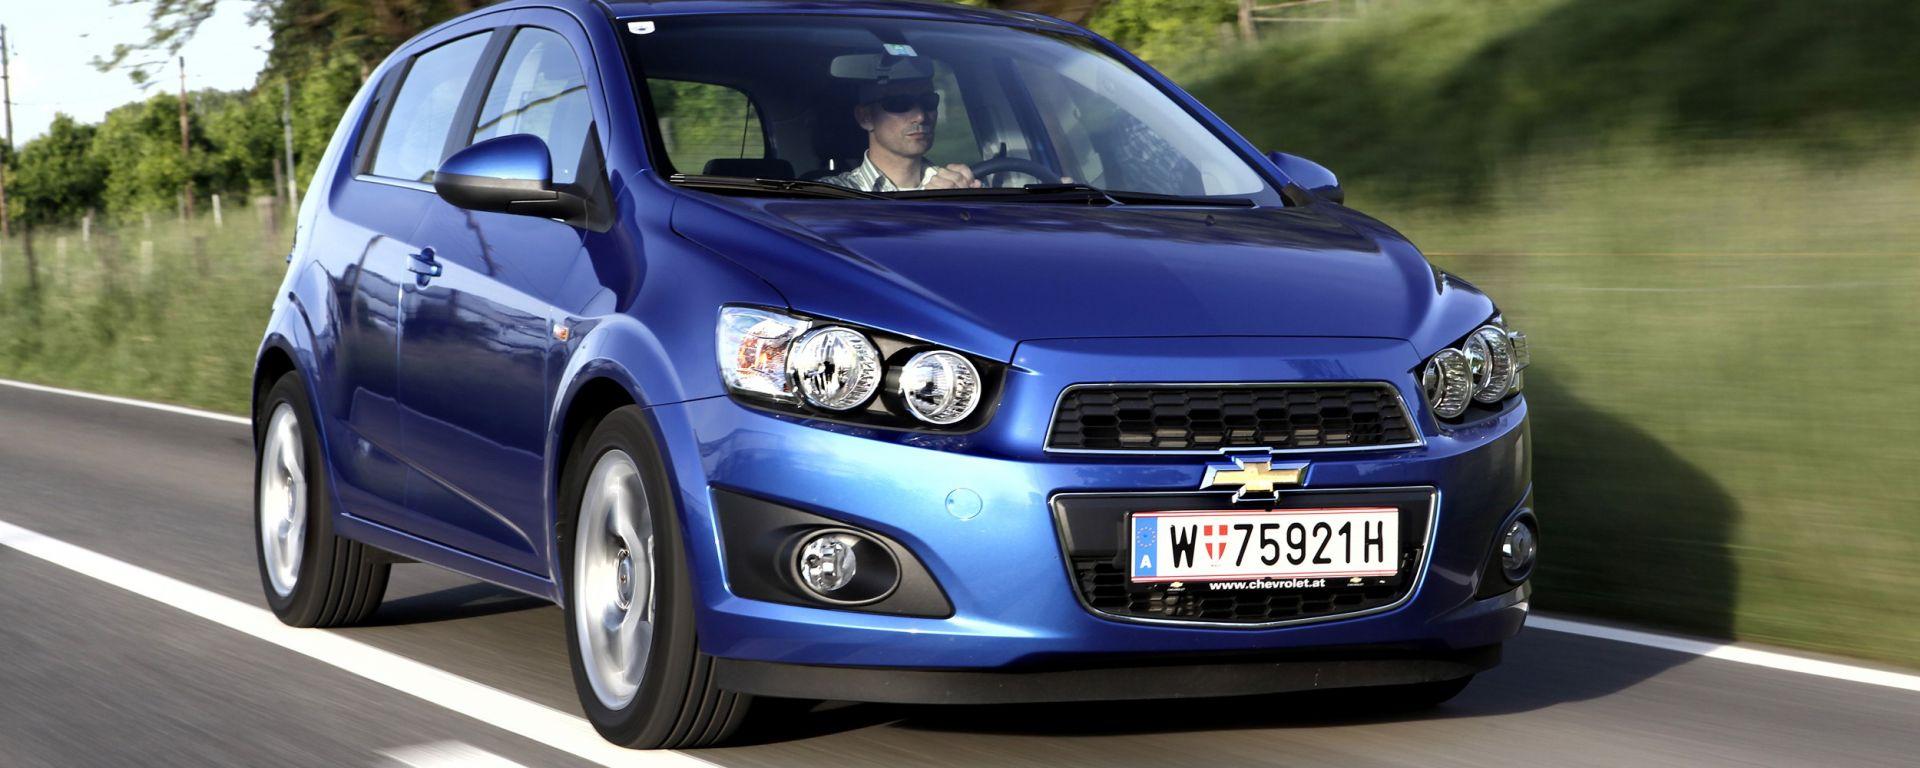 Chevrolet Aveo 1.3 Diesel